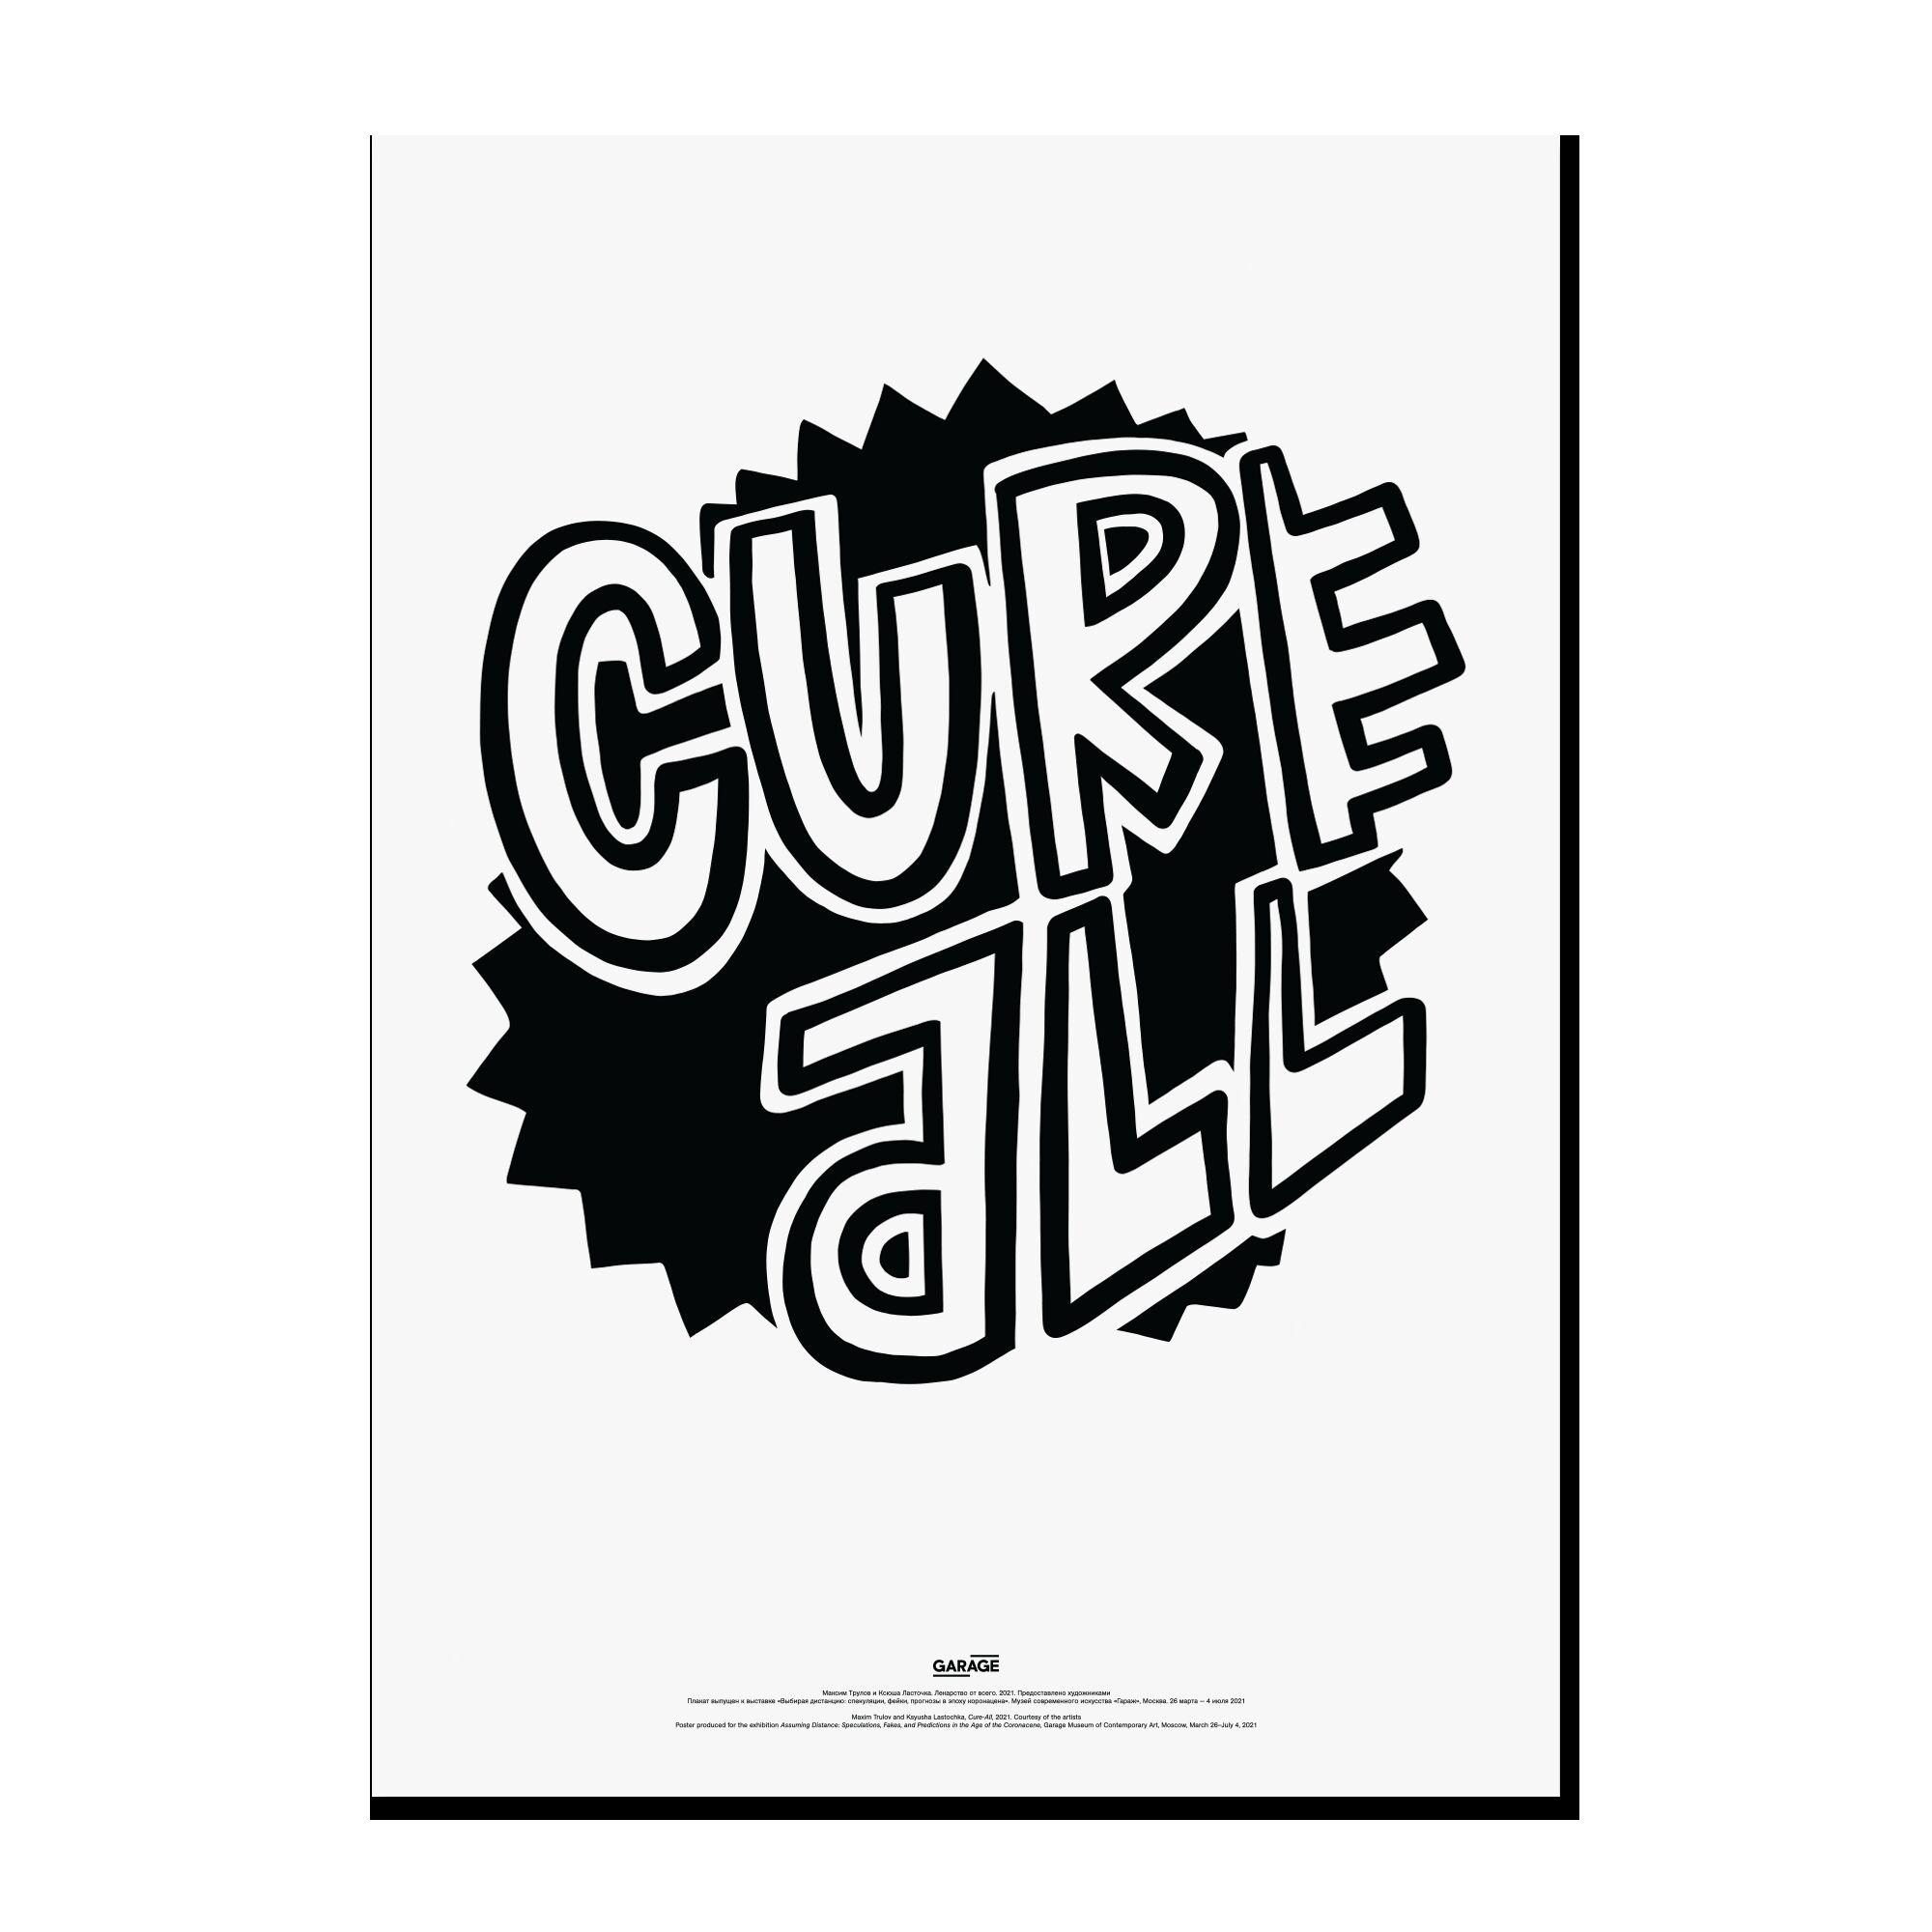 Постер Cure All, дизайн: Максим Трулов и Ксюша Ласточка